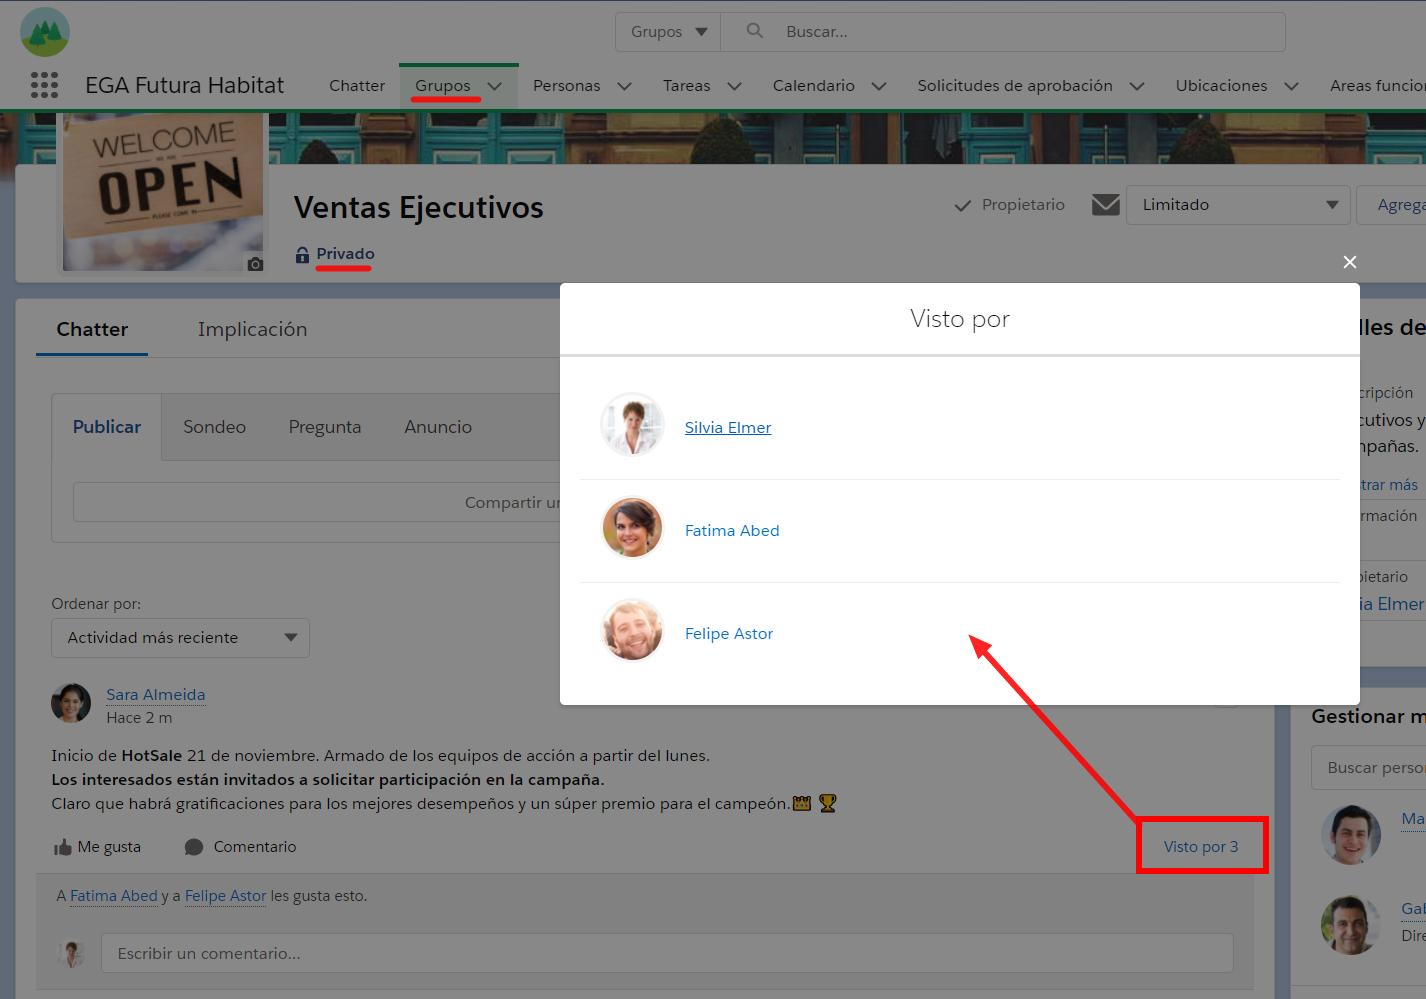 Visto por cantidad usuarios visualizan publicacion Chatter EGA Futura ERP nube